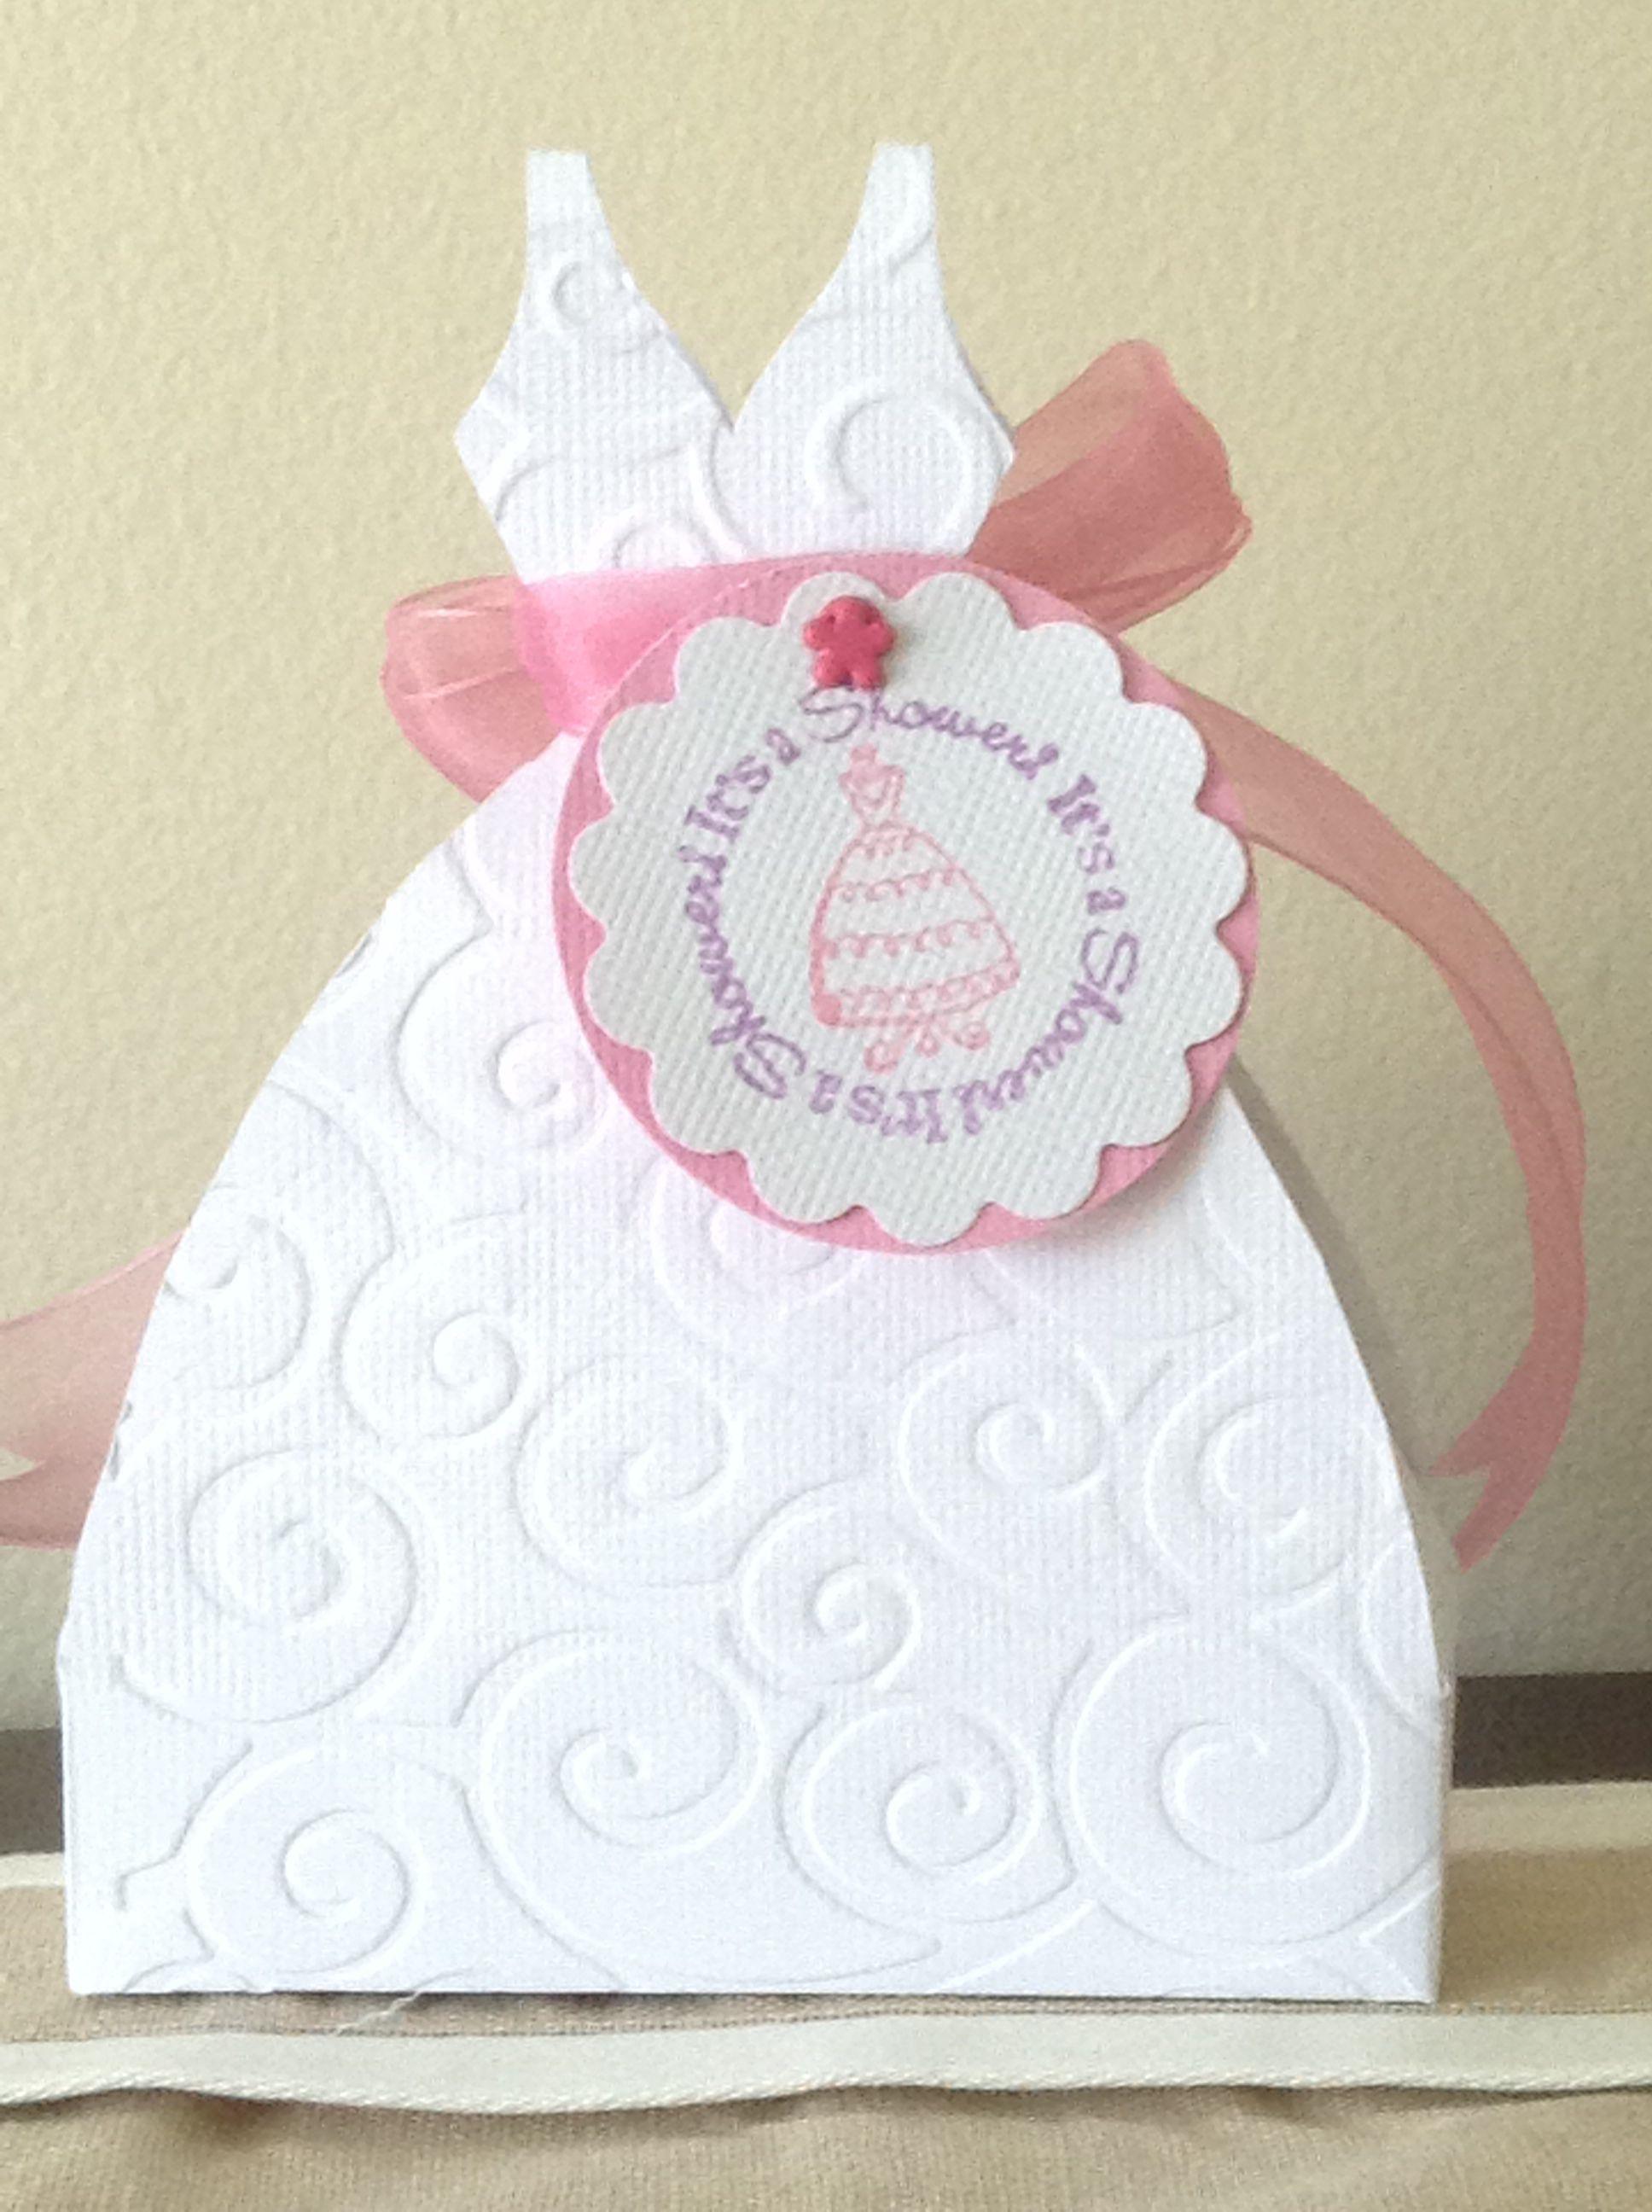 Wedding Shower Gift Card Holder using Cricut Tags, Bags